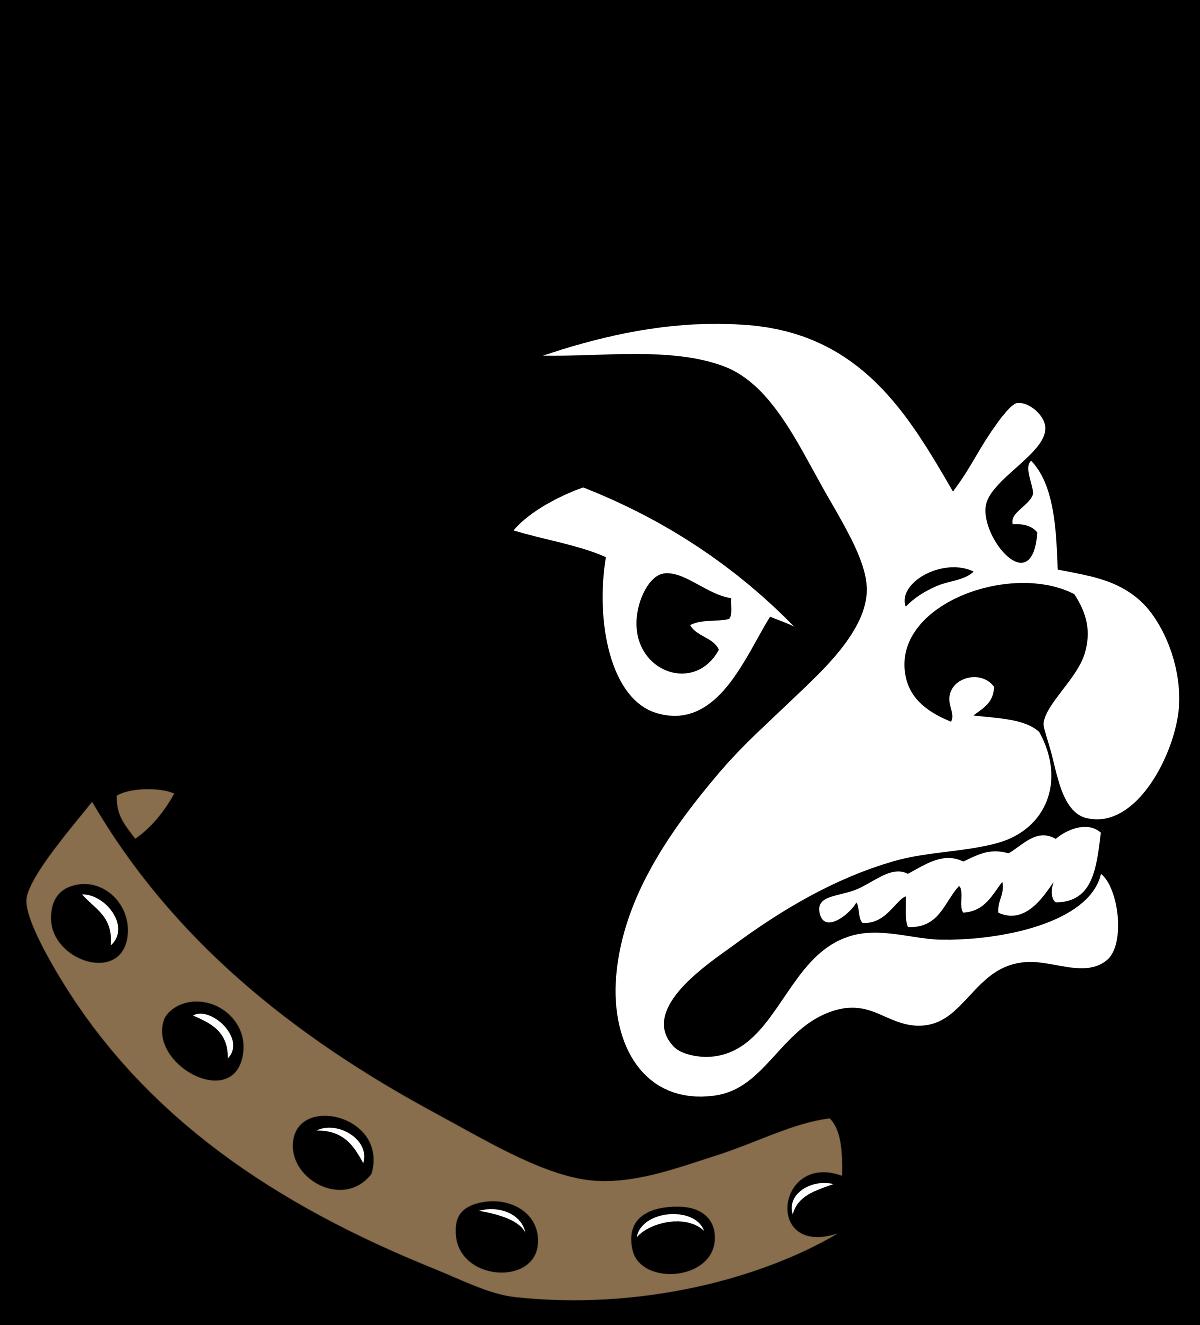 Team logo 251